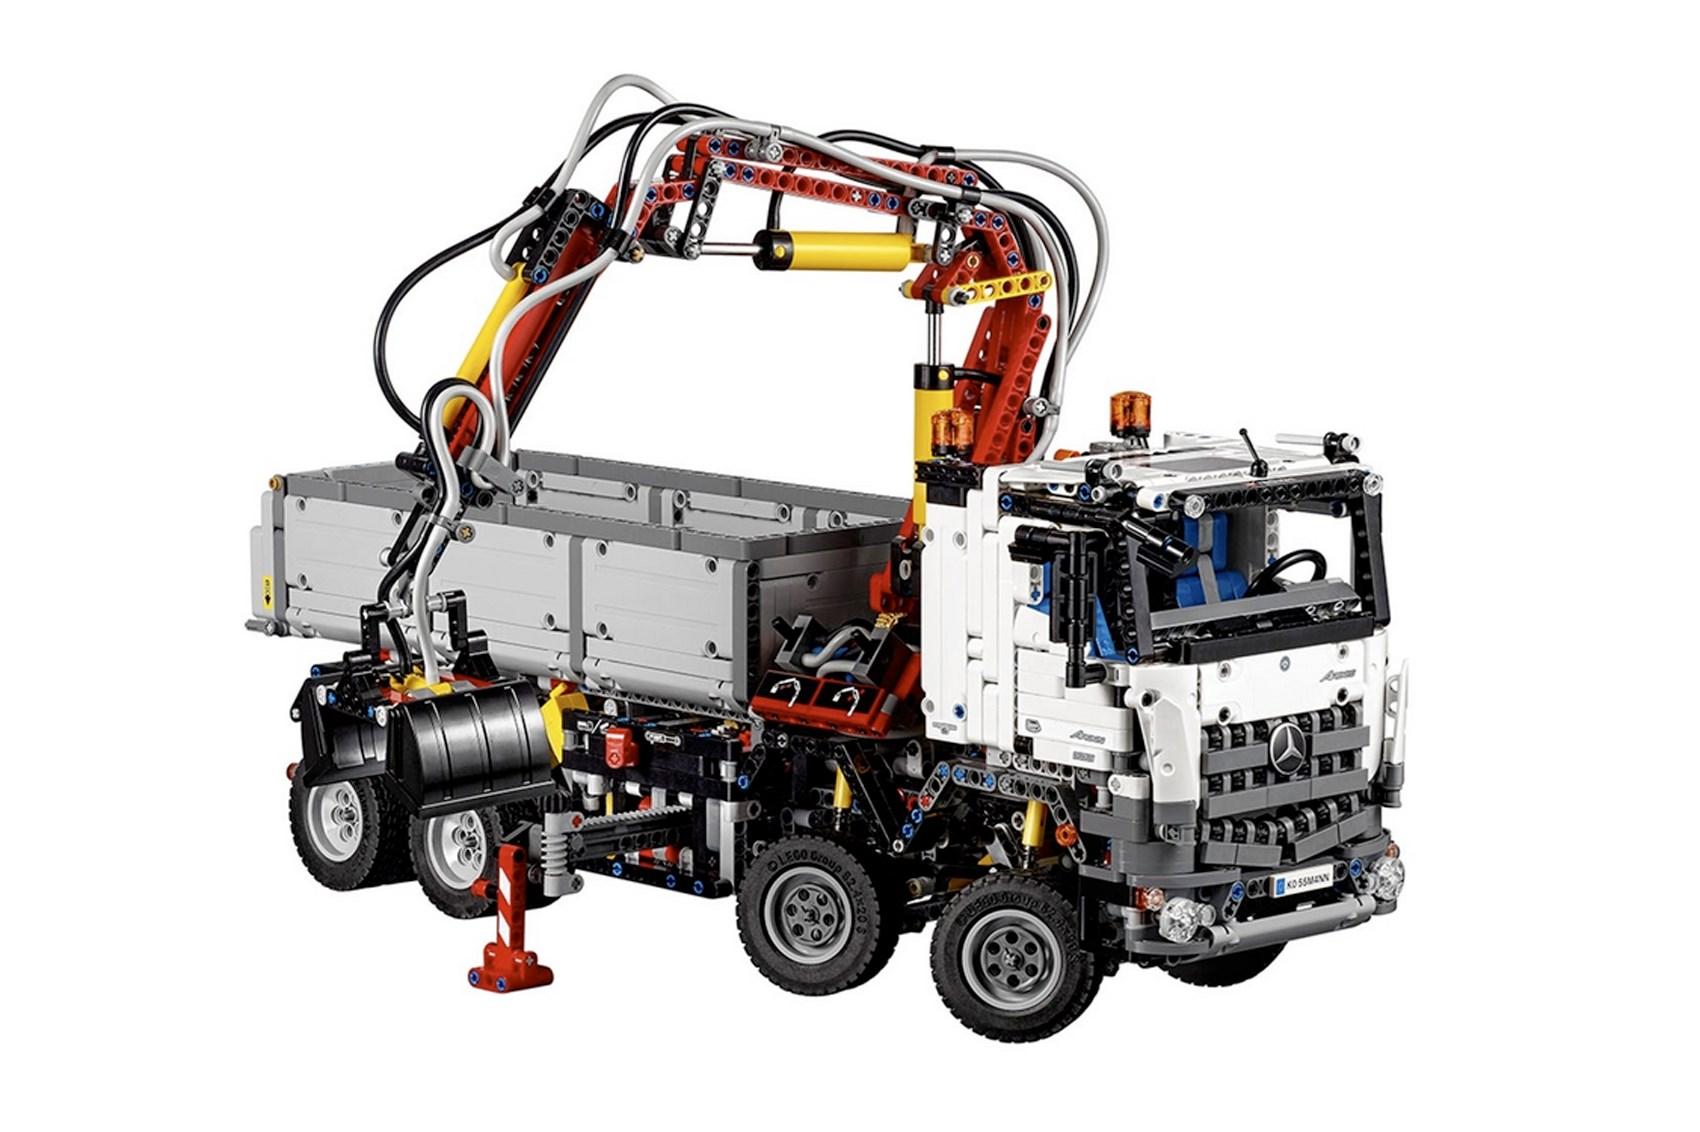 Best car Lego sets to get through lockdown